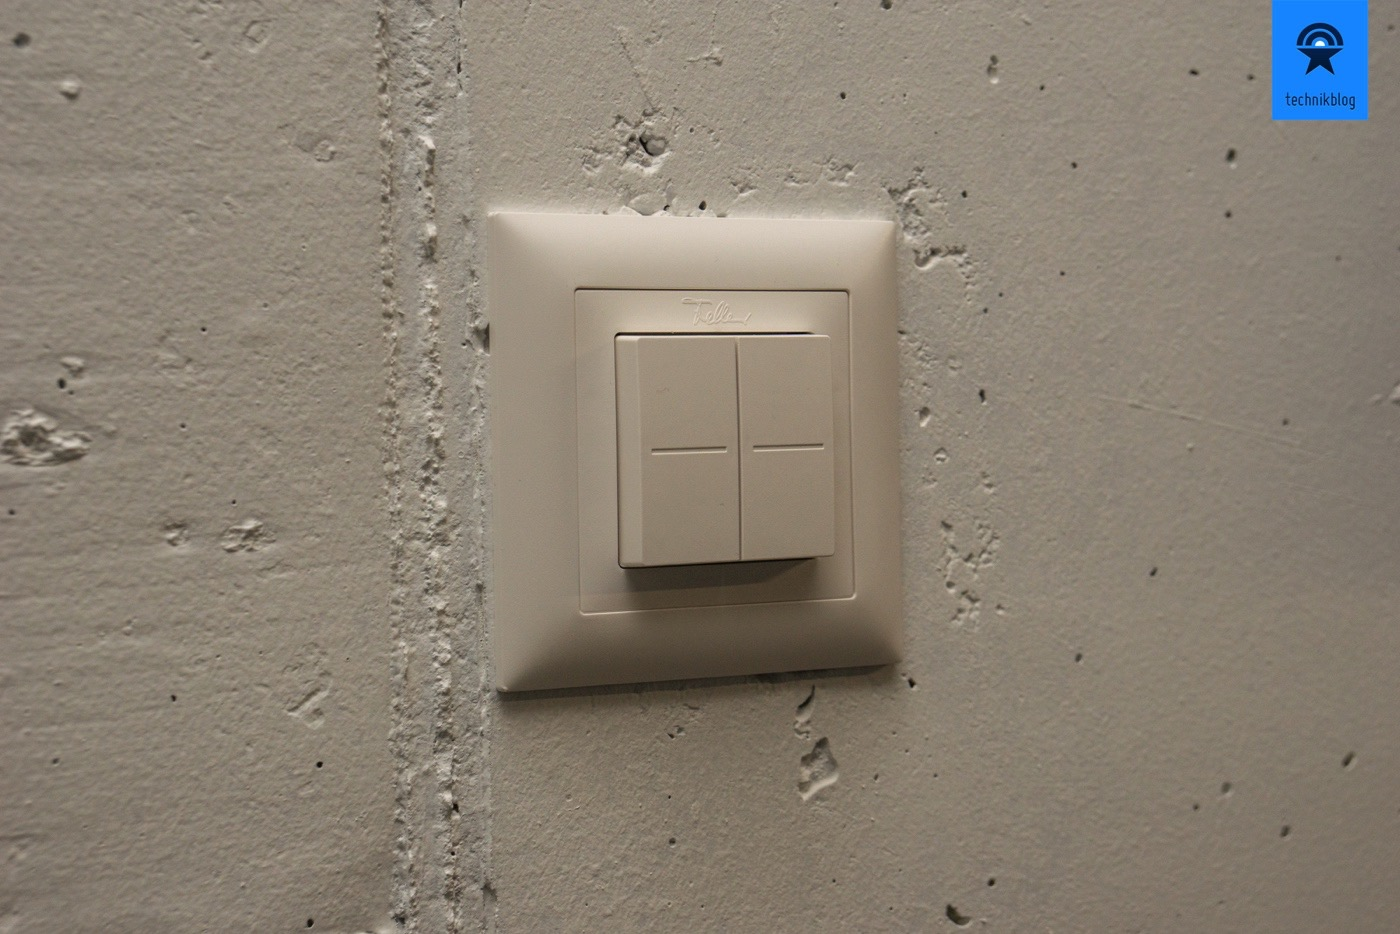 Feller Smart Light Control in 1-fach Rahmen verbaut